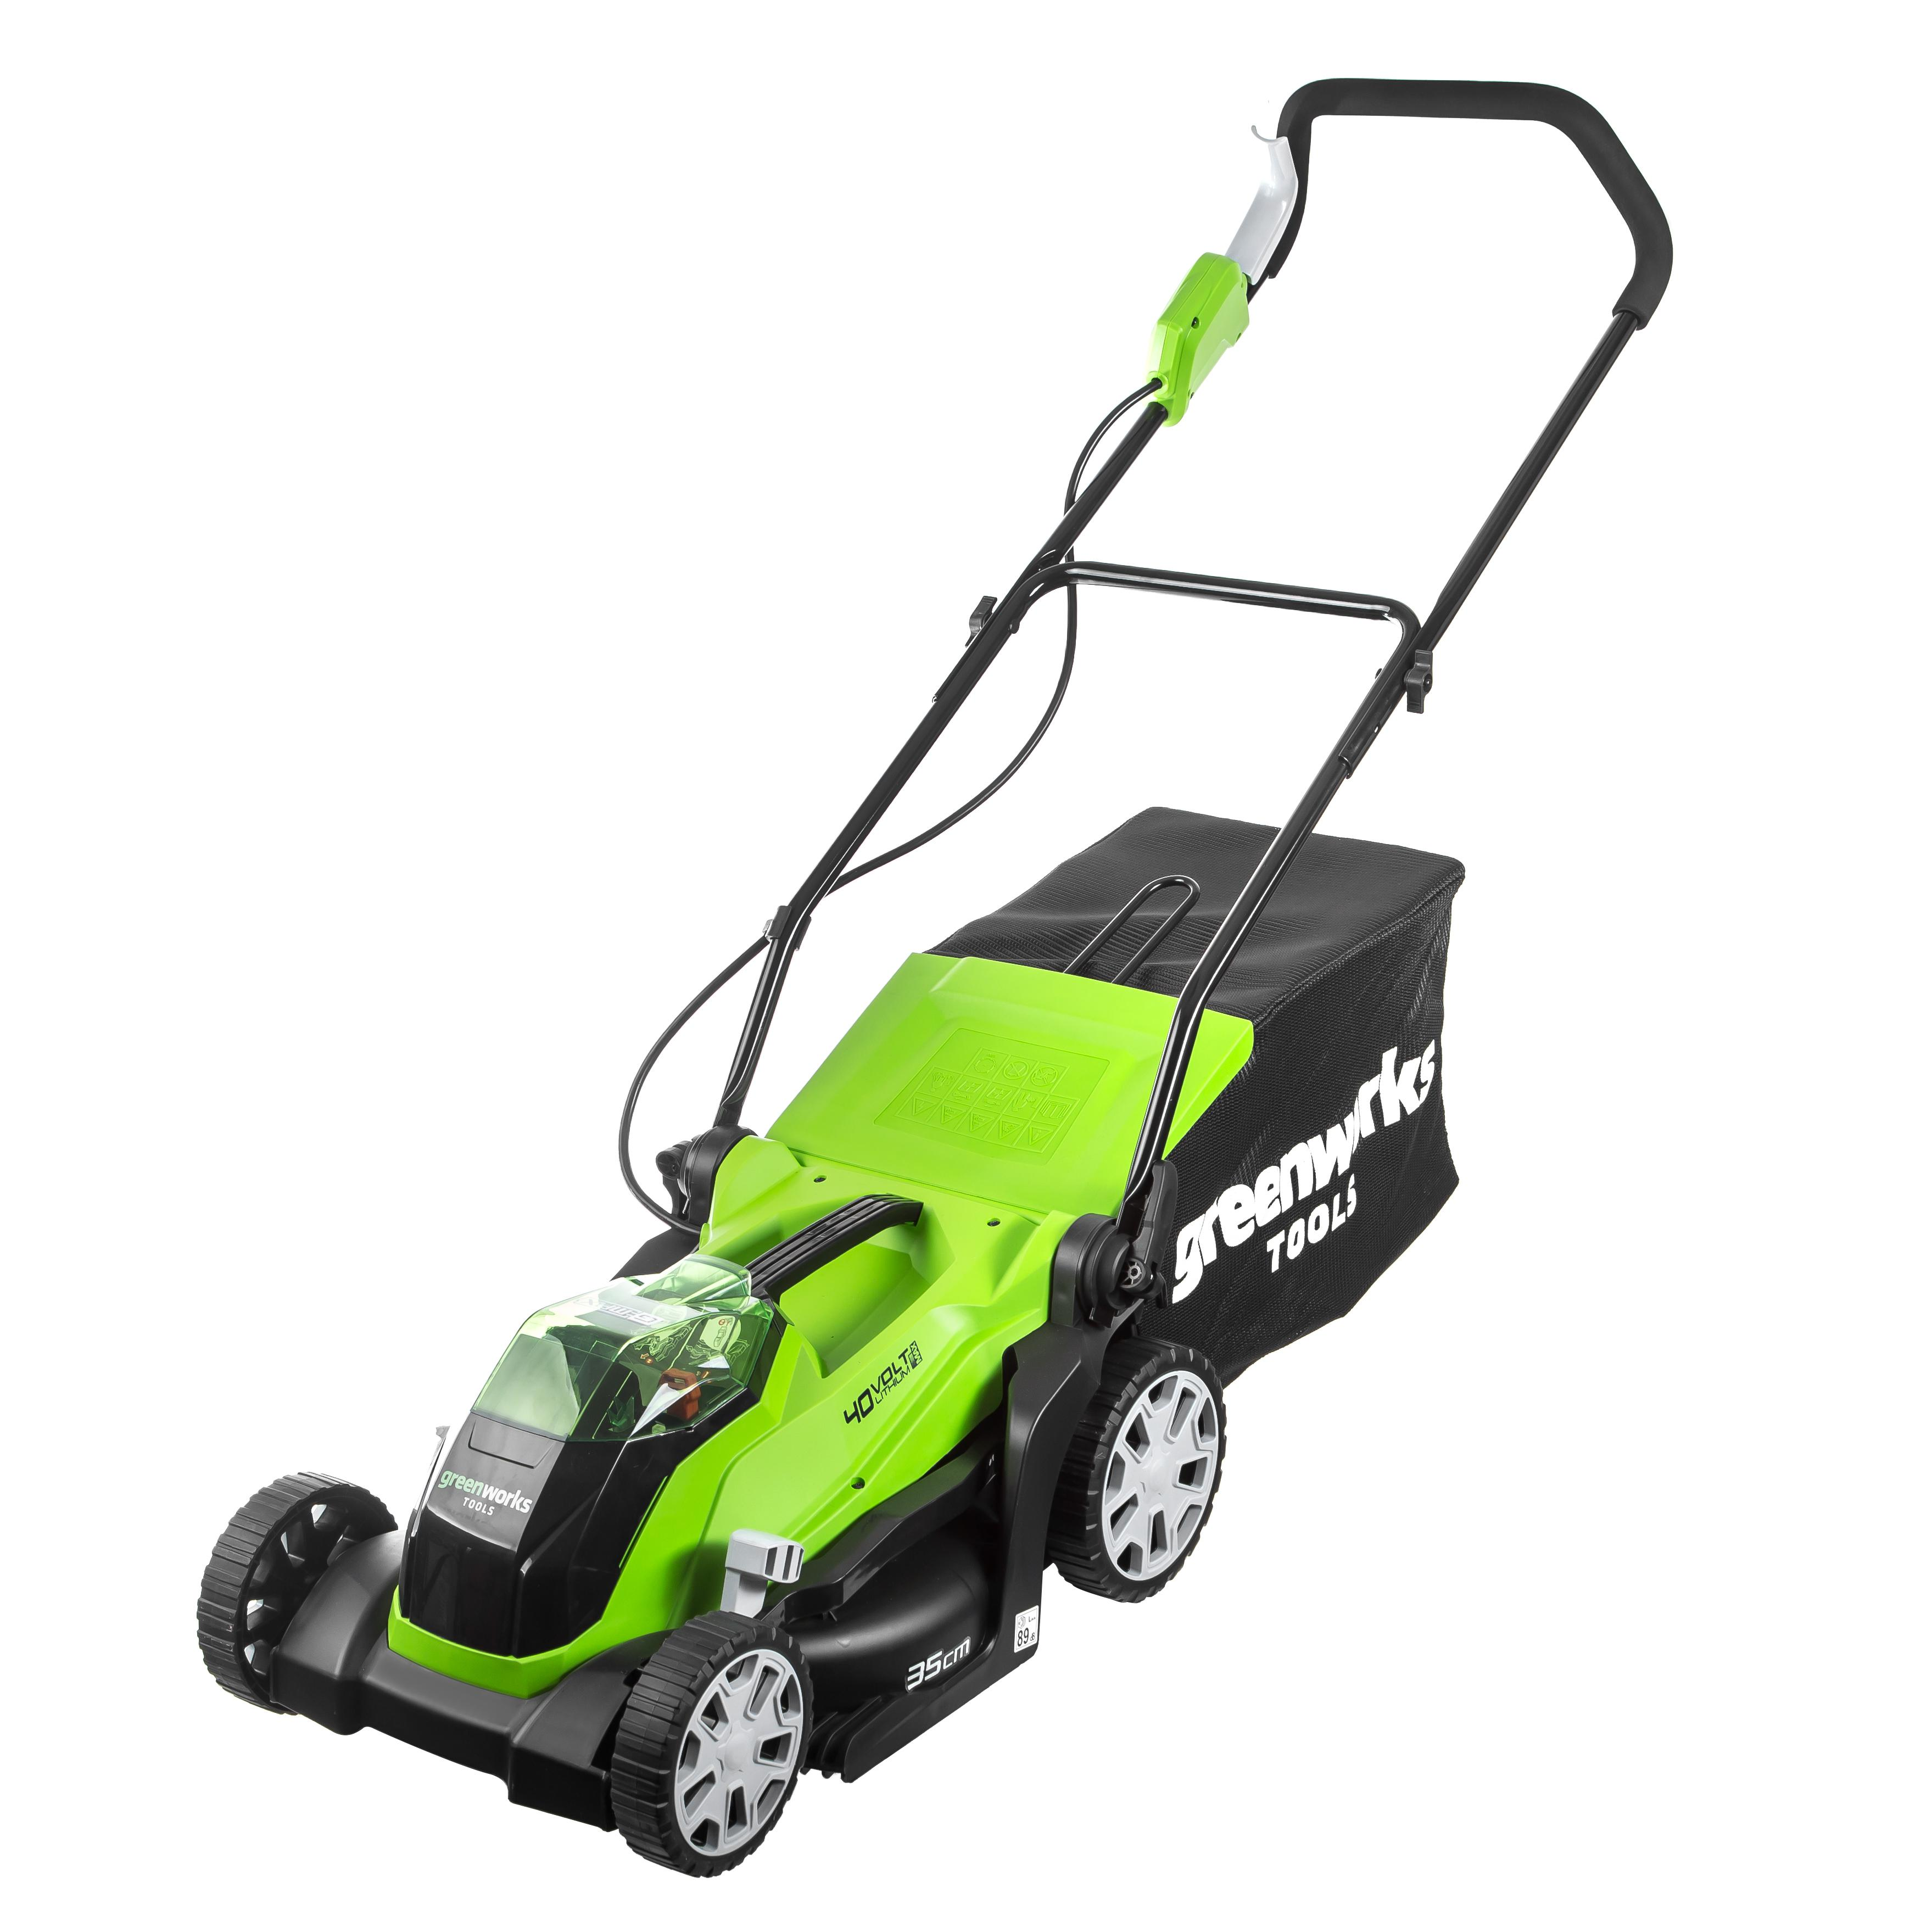 Rechargeable газонокосилка GreenWorks G40lm35k2 (2501907ua) 1x40 V 2AH Zu